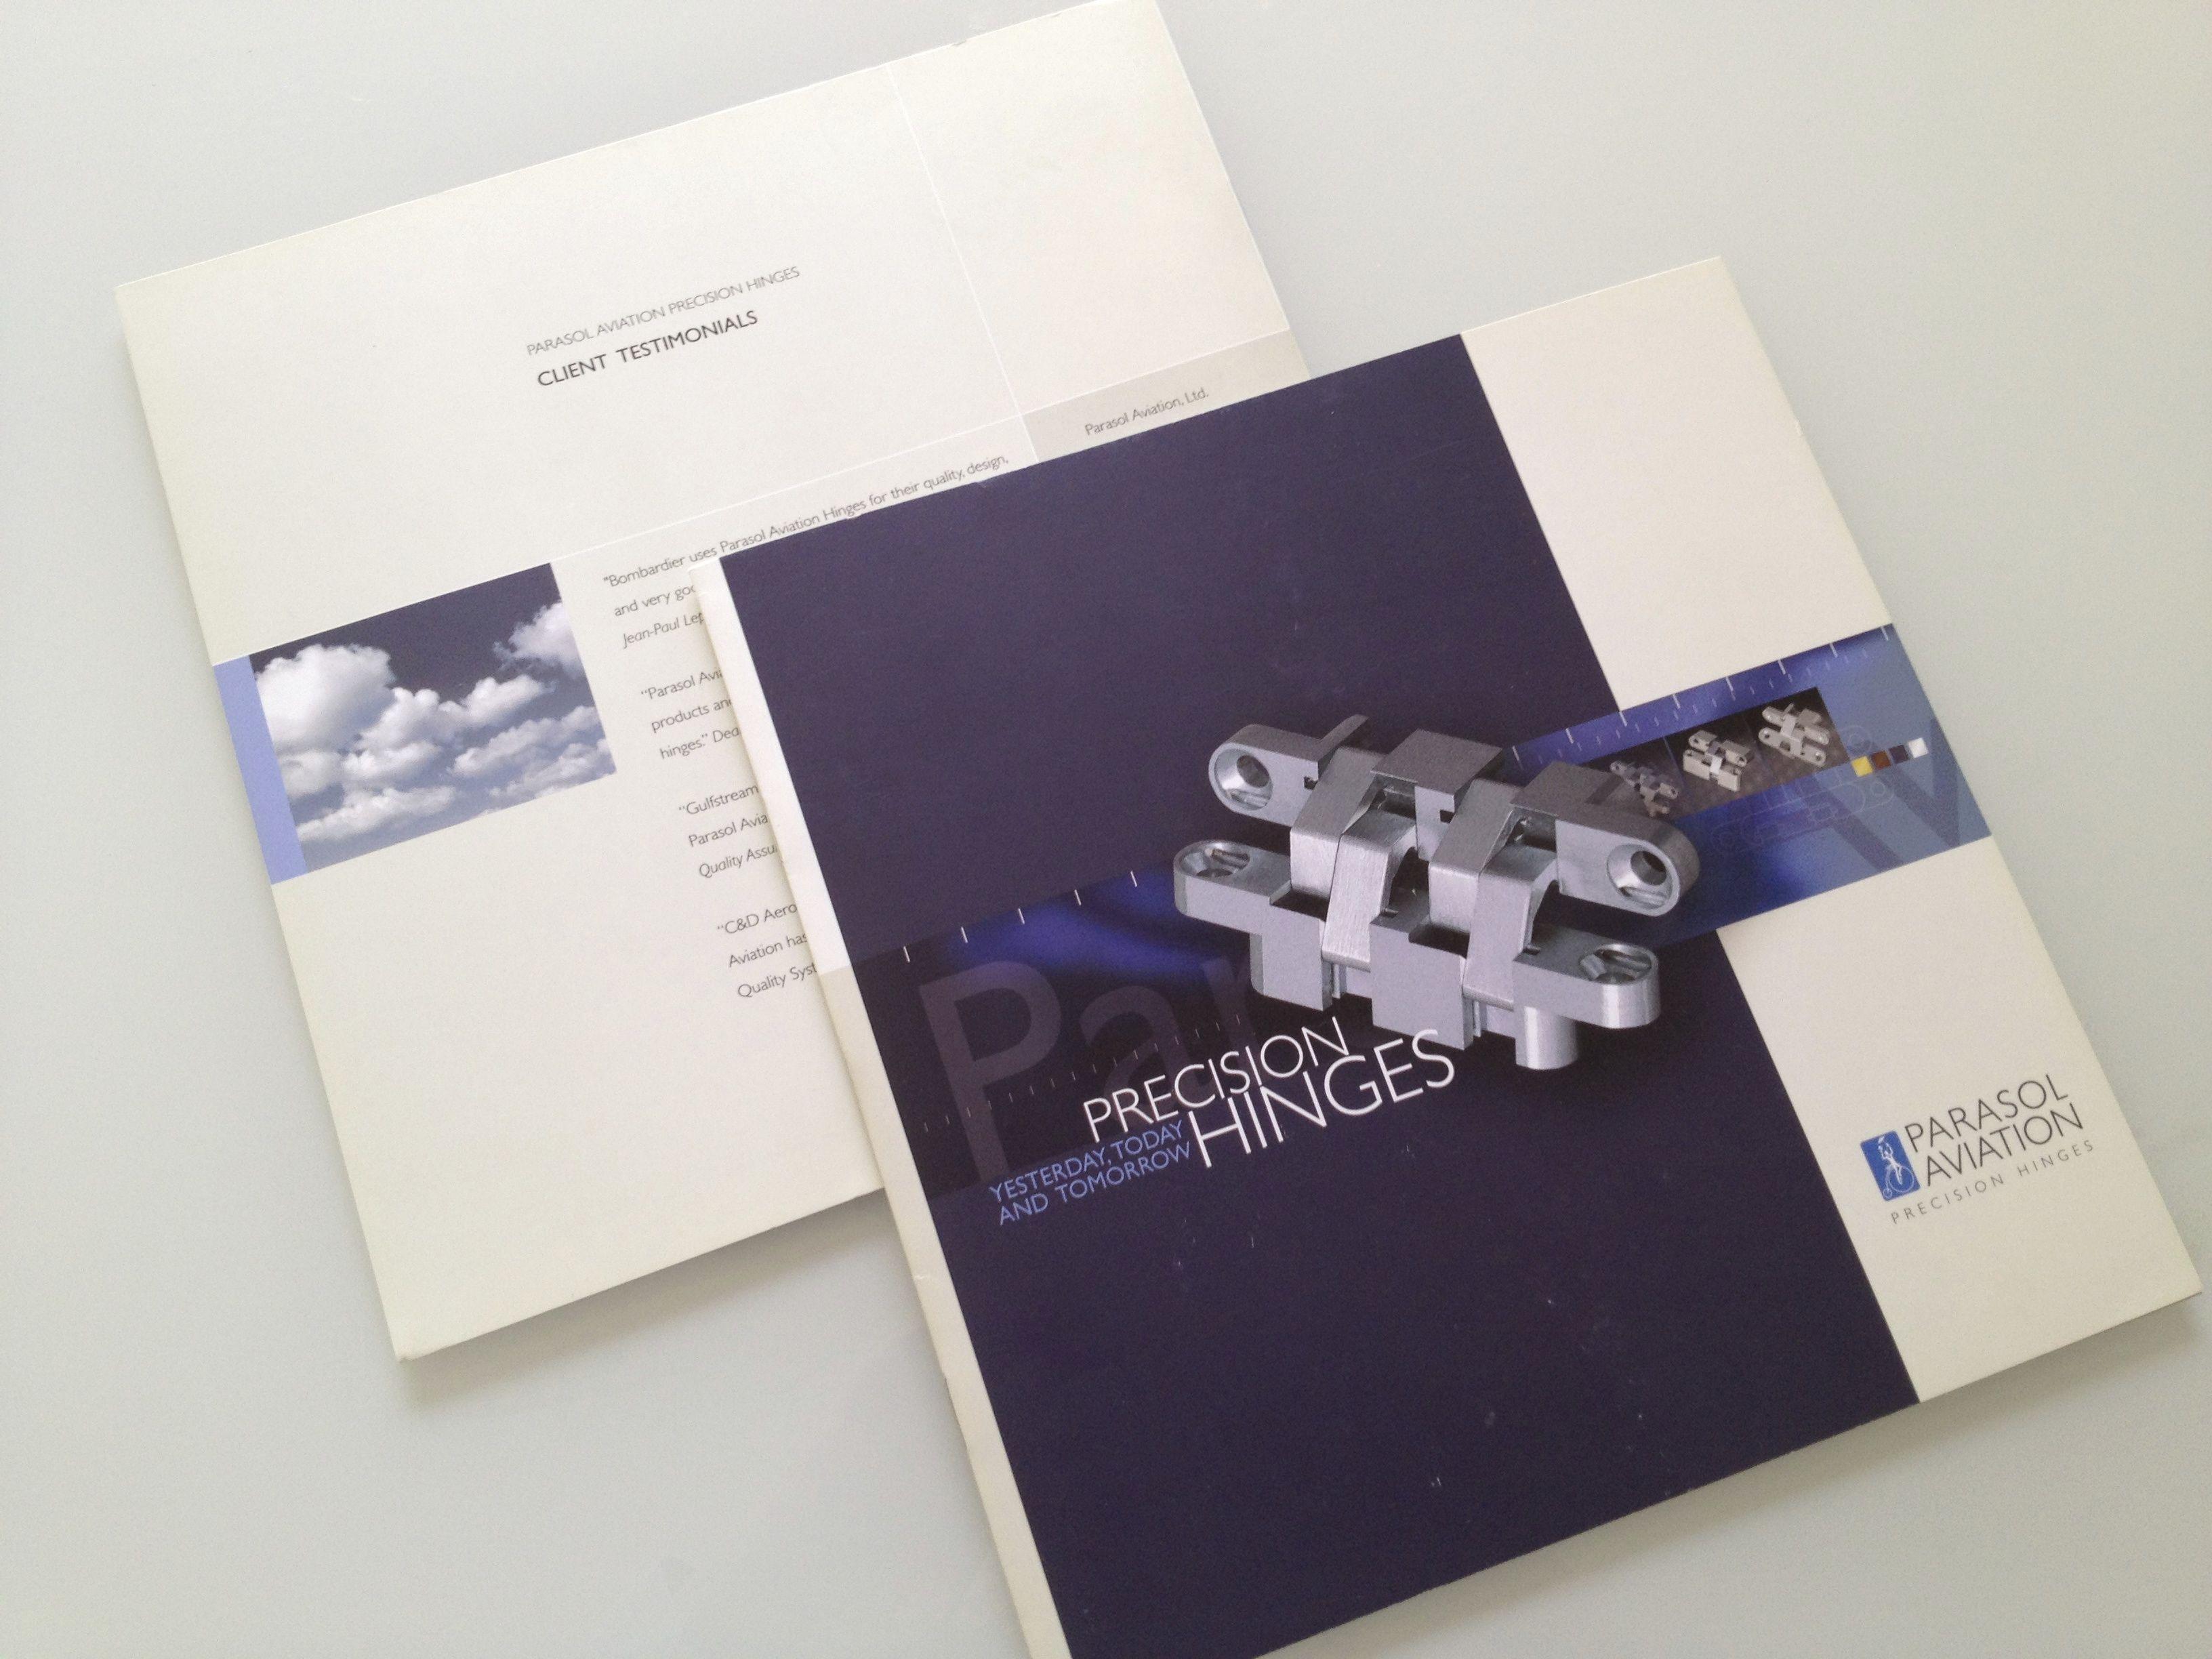 ca51d29a0192487539cf8cc376912a6a Meilleur De De Parasol Design Concept